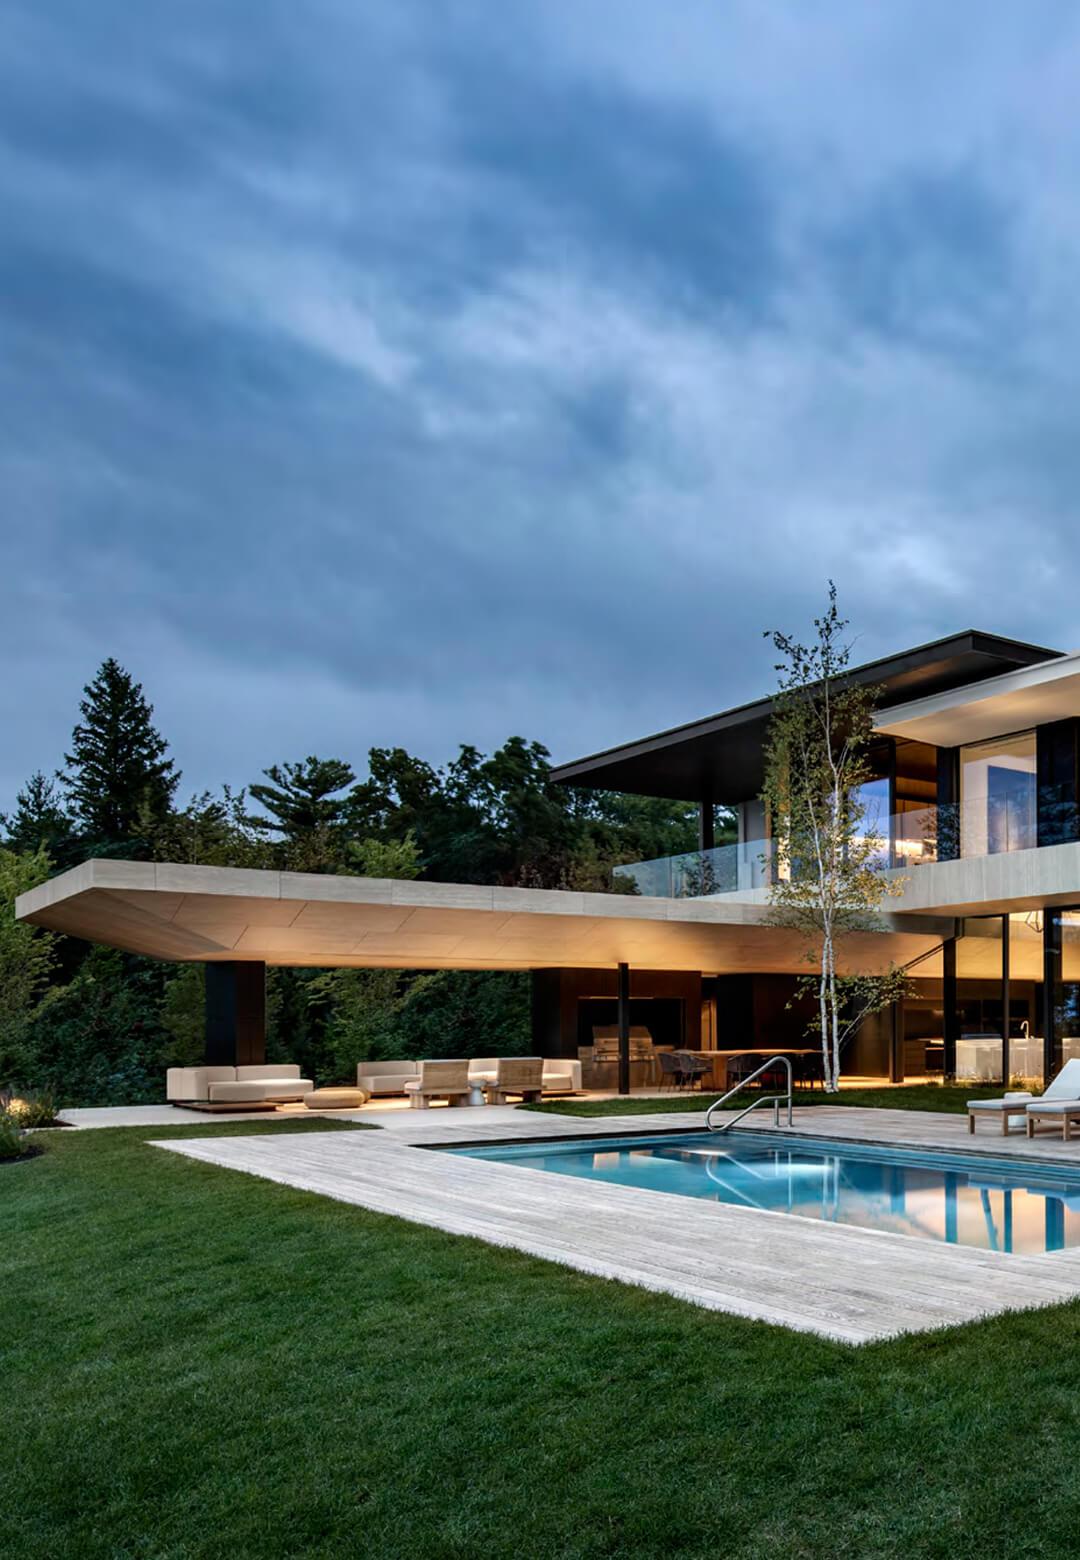 SAOTA designs a modern summer holiday home in Lake Huron, Canada | Lake Huron Residence by SAOTA | STIRworld